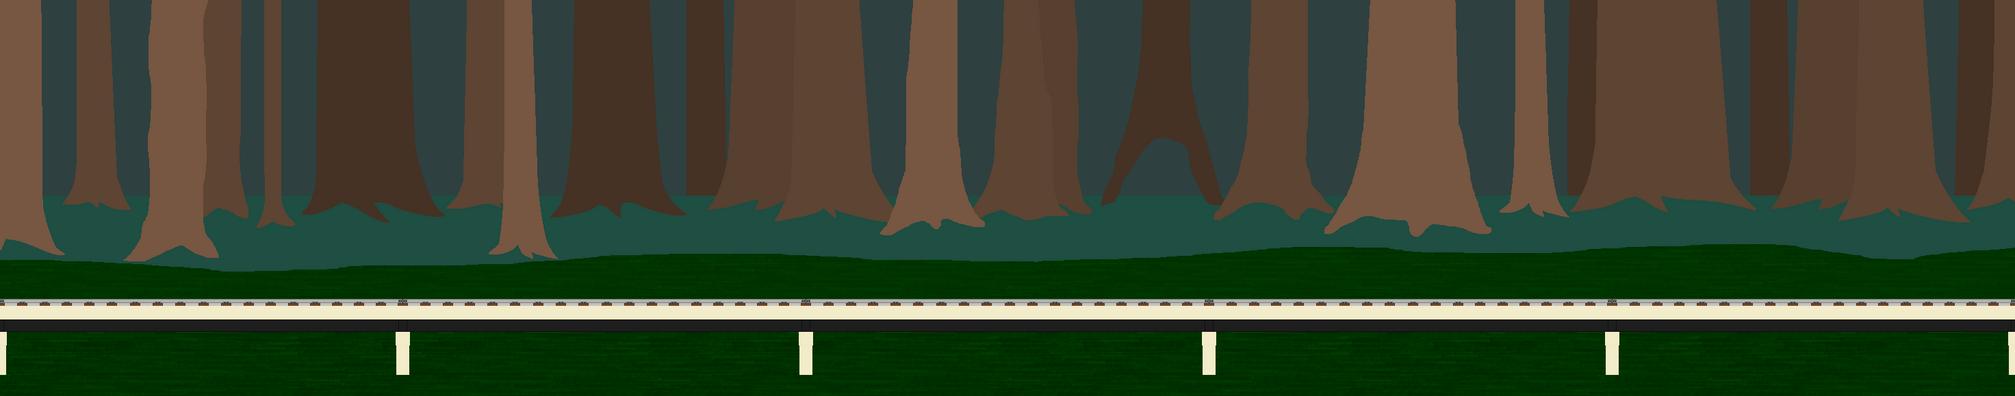 Swampton Forest by RyanBrony765